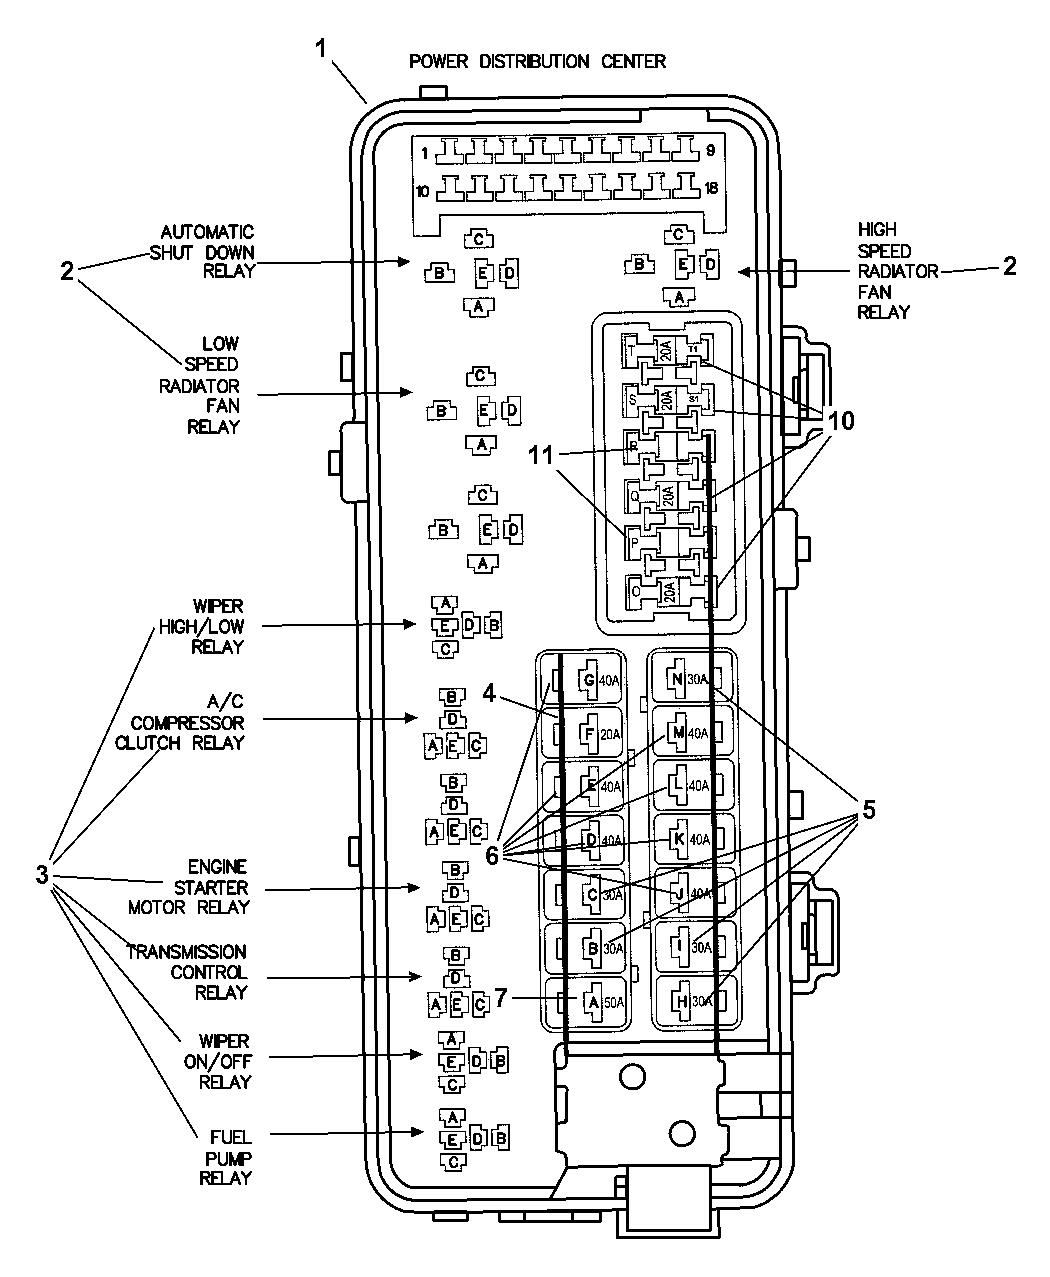 2004 dodge intrepid power distribution center relays fuses rh moparpartsgiant com 2002 dodge intrepid stereo wiring diagram 2002 dodge intrepid stereo wiring diagram